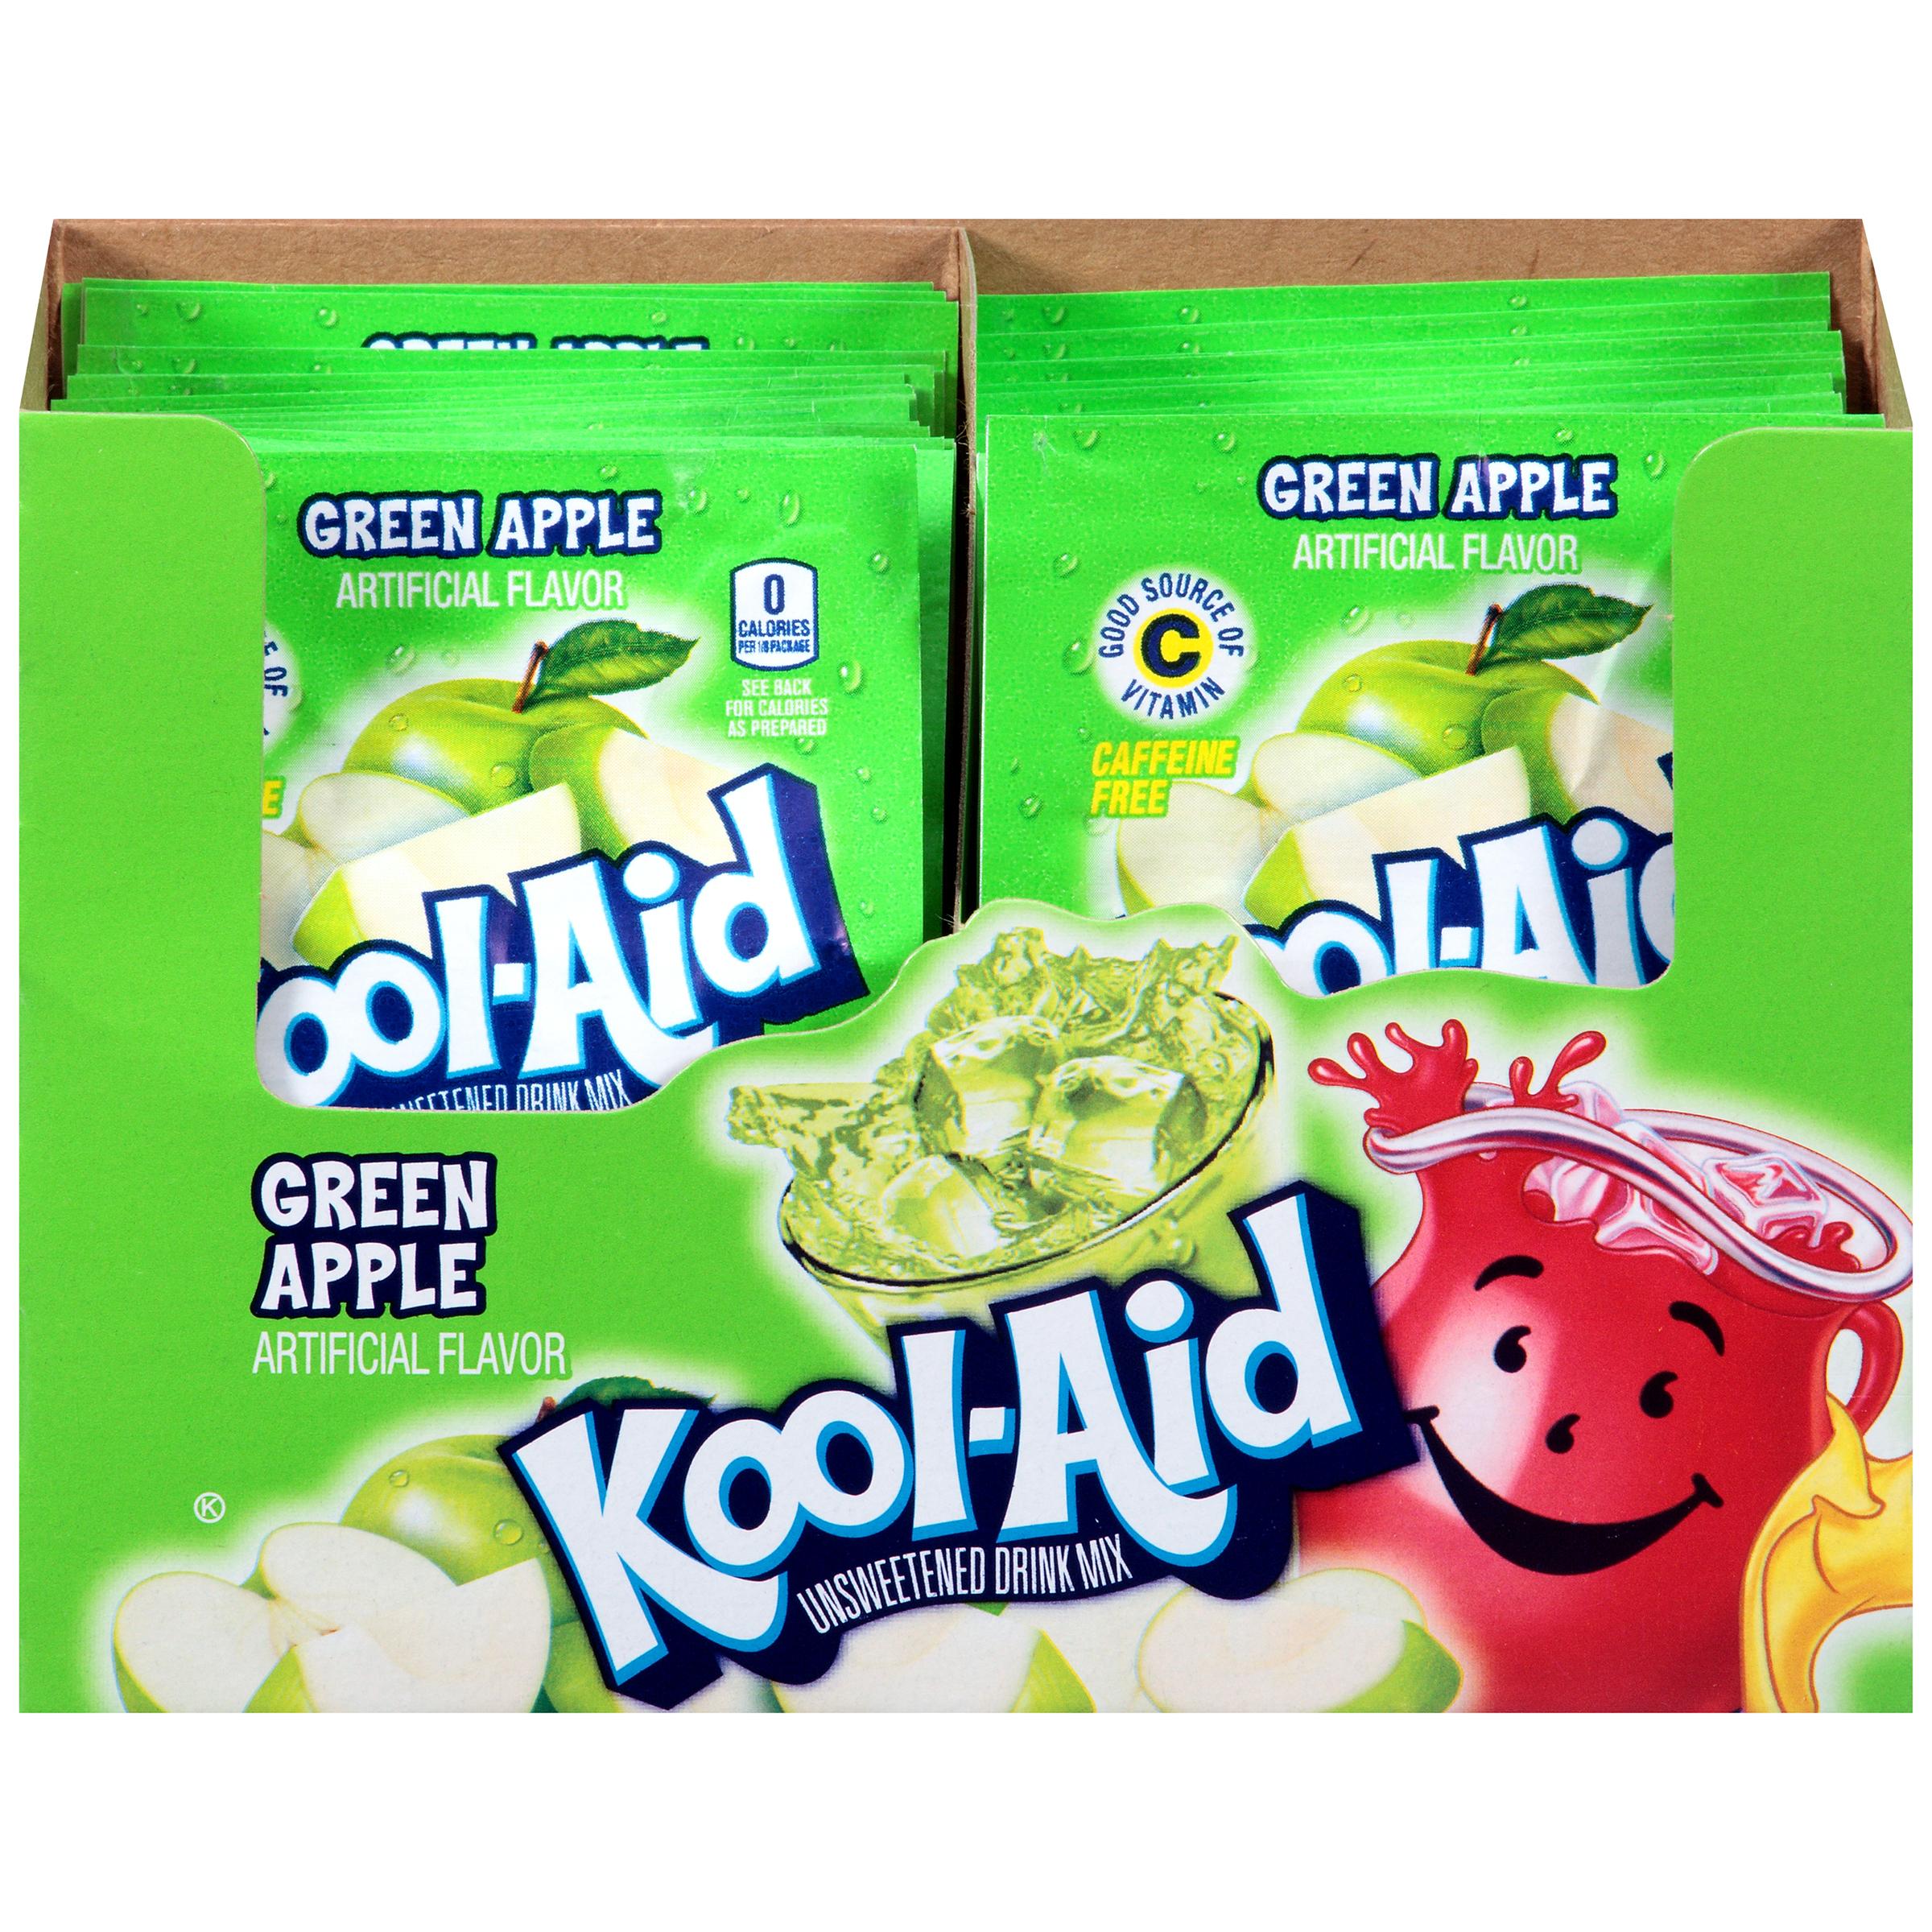 Kool-Aid Green Apple Drink Mix 0.22 oz. Packet image